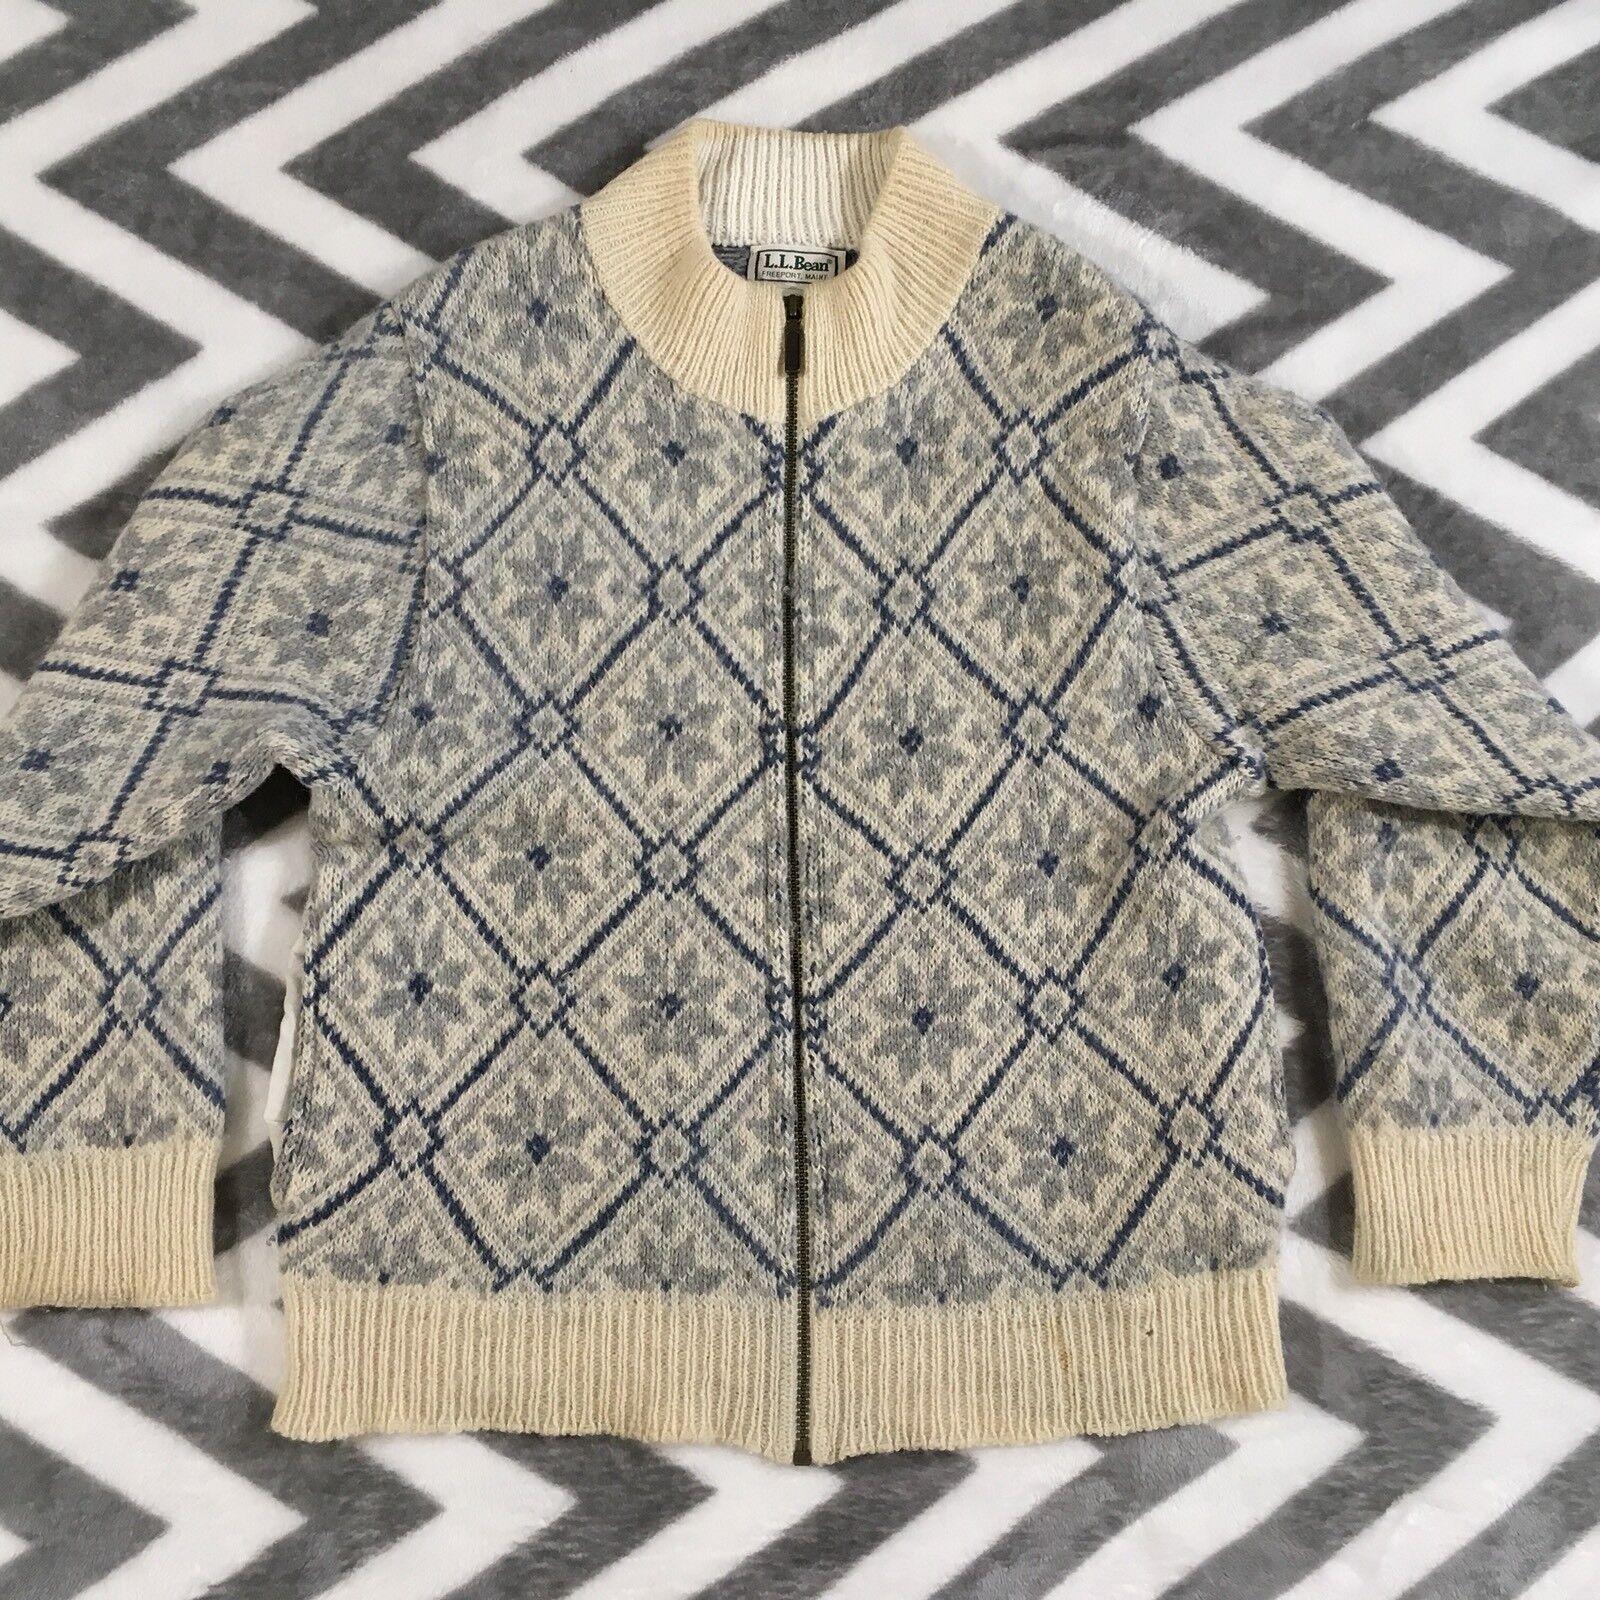 LL Bean Womens Large L Vtg Knit Wool Alpaca Full Zip Sweater bluee Cream